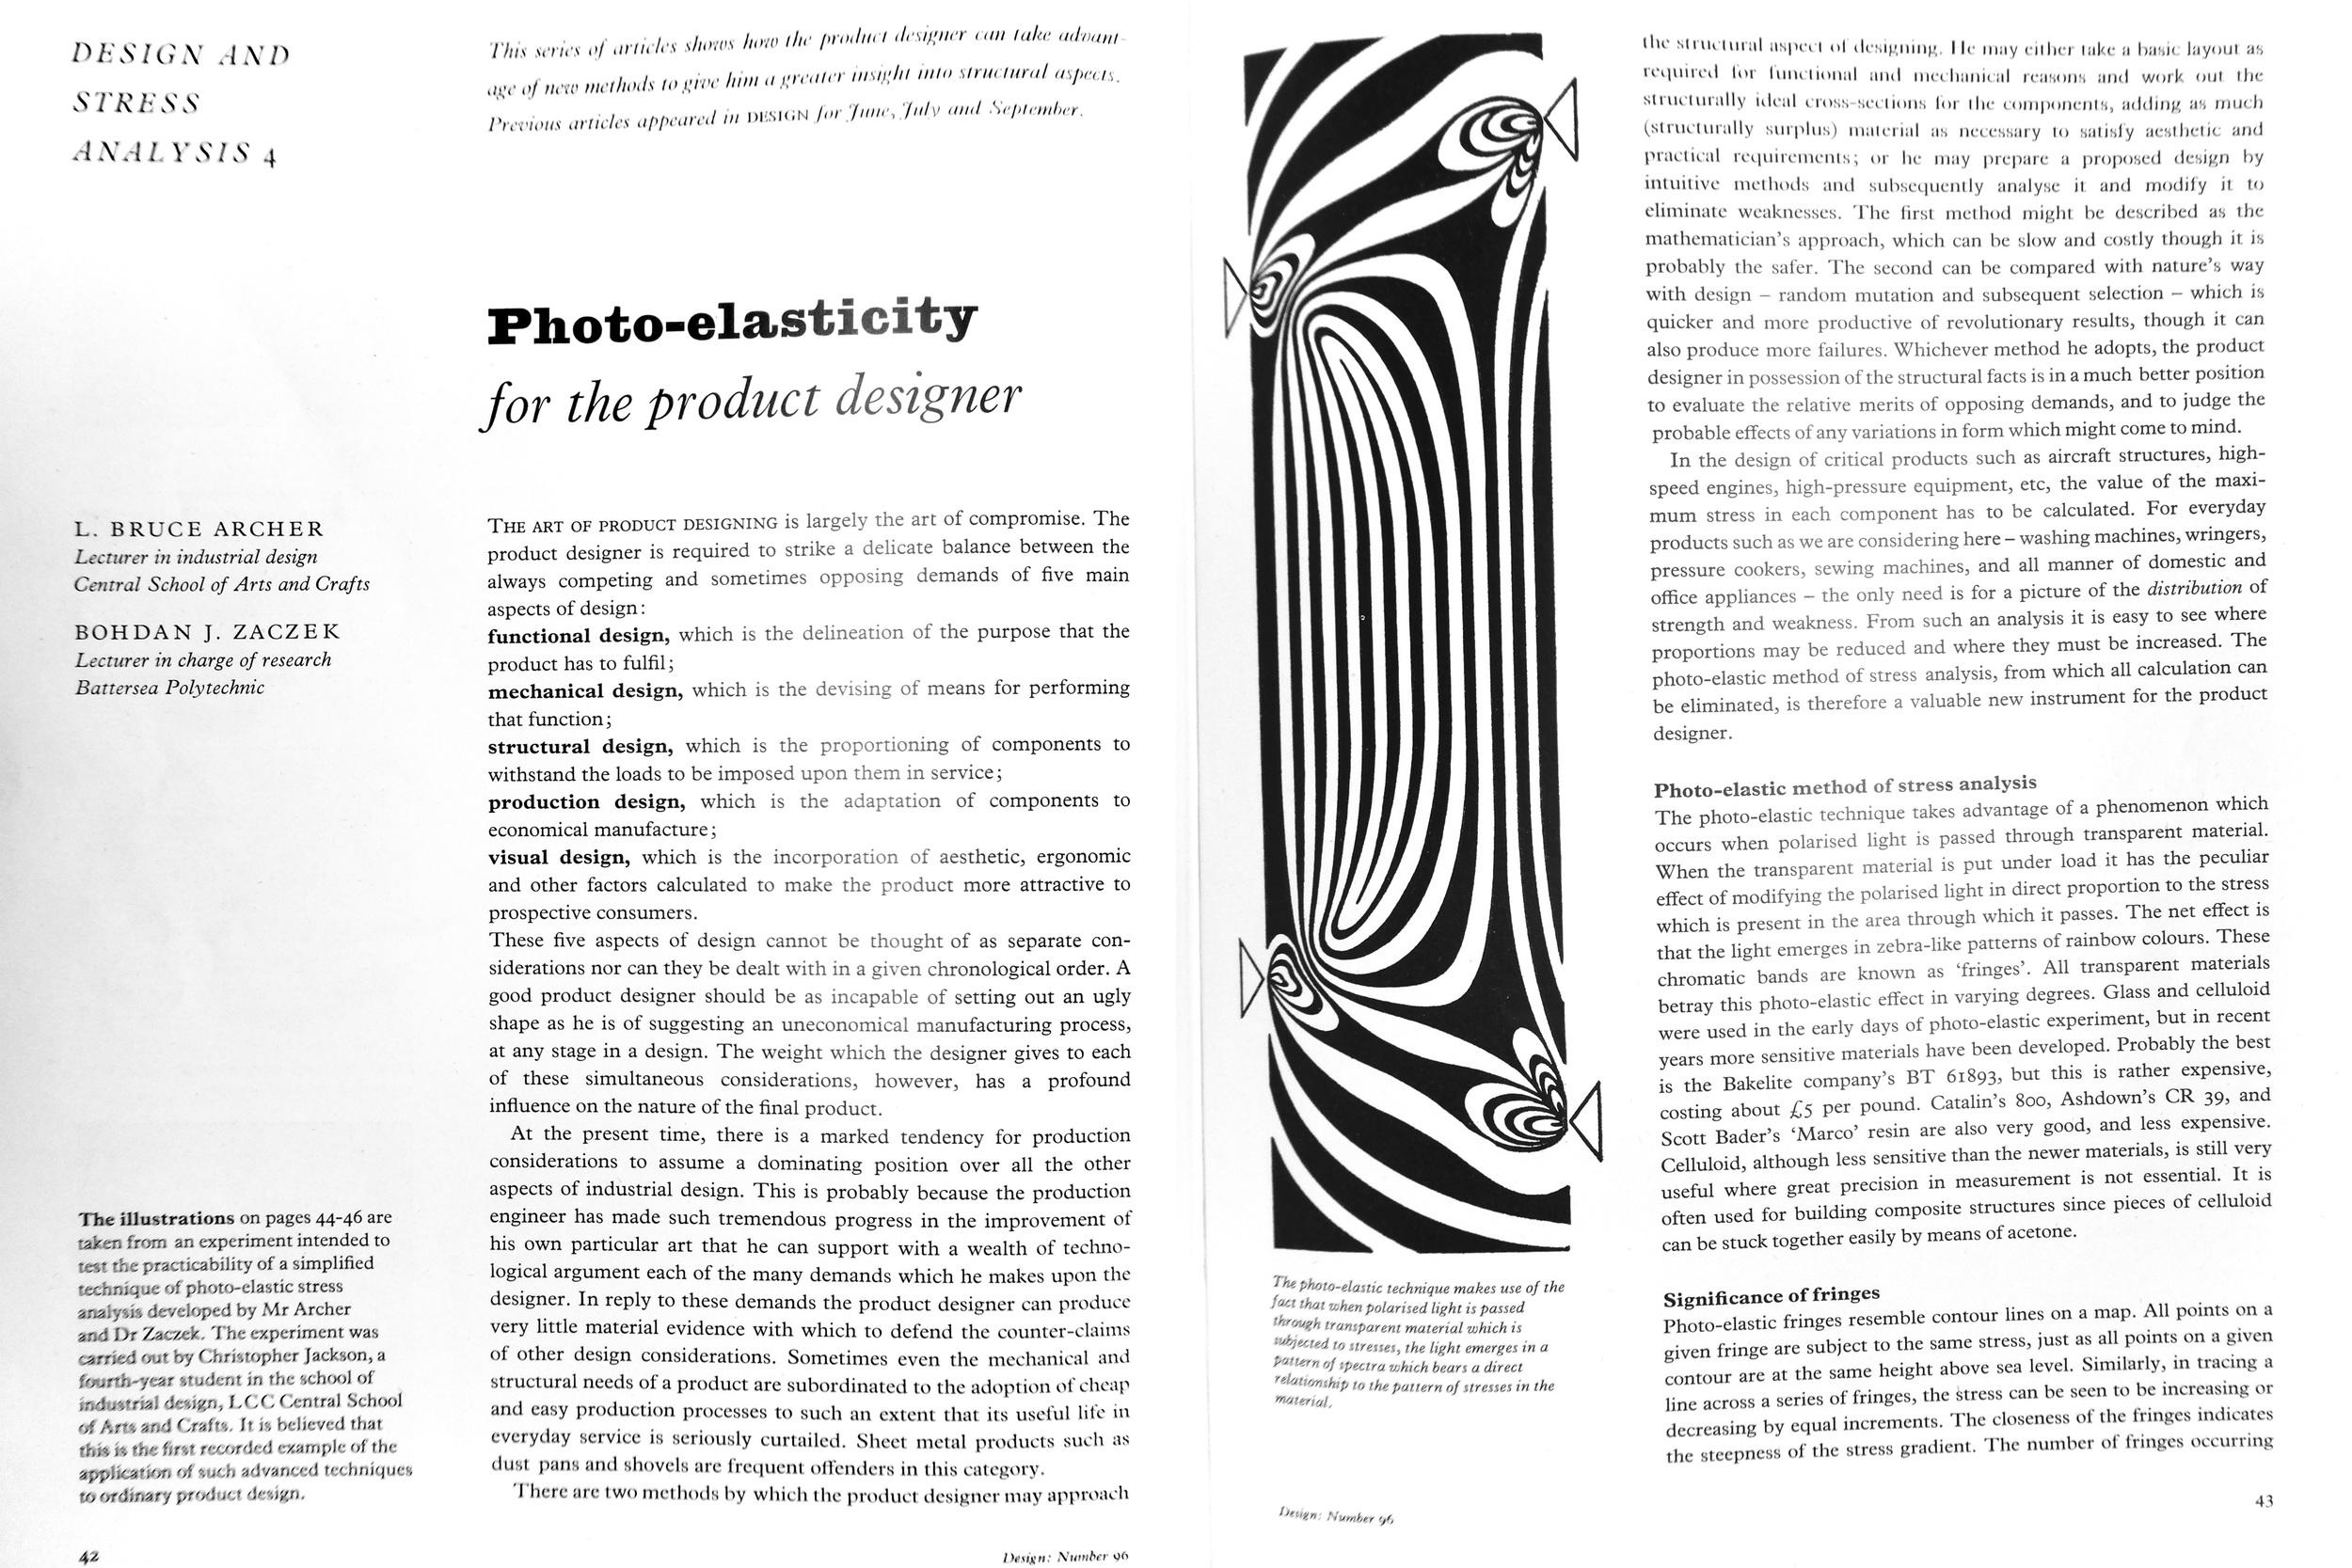 DDR_Photo-elasticity-for-the-Product-Designer_Sept_1956.jpg